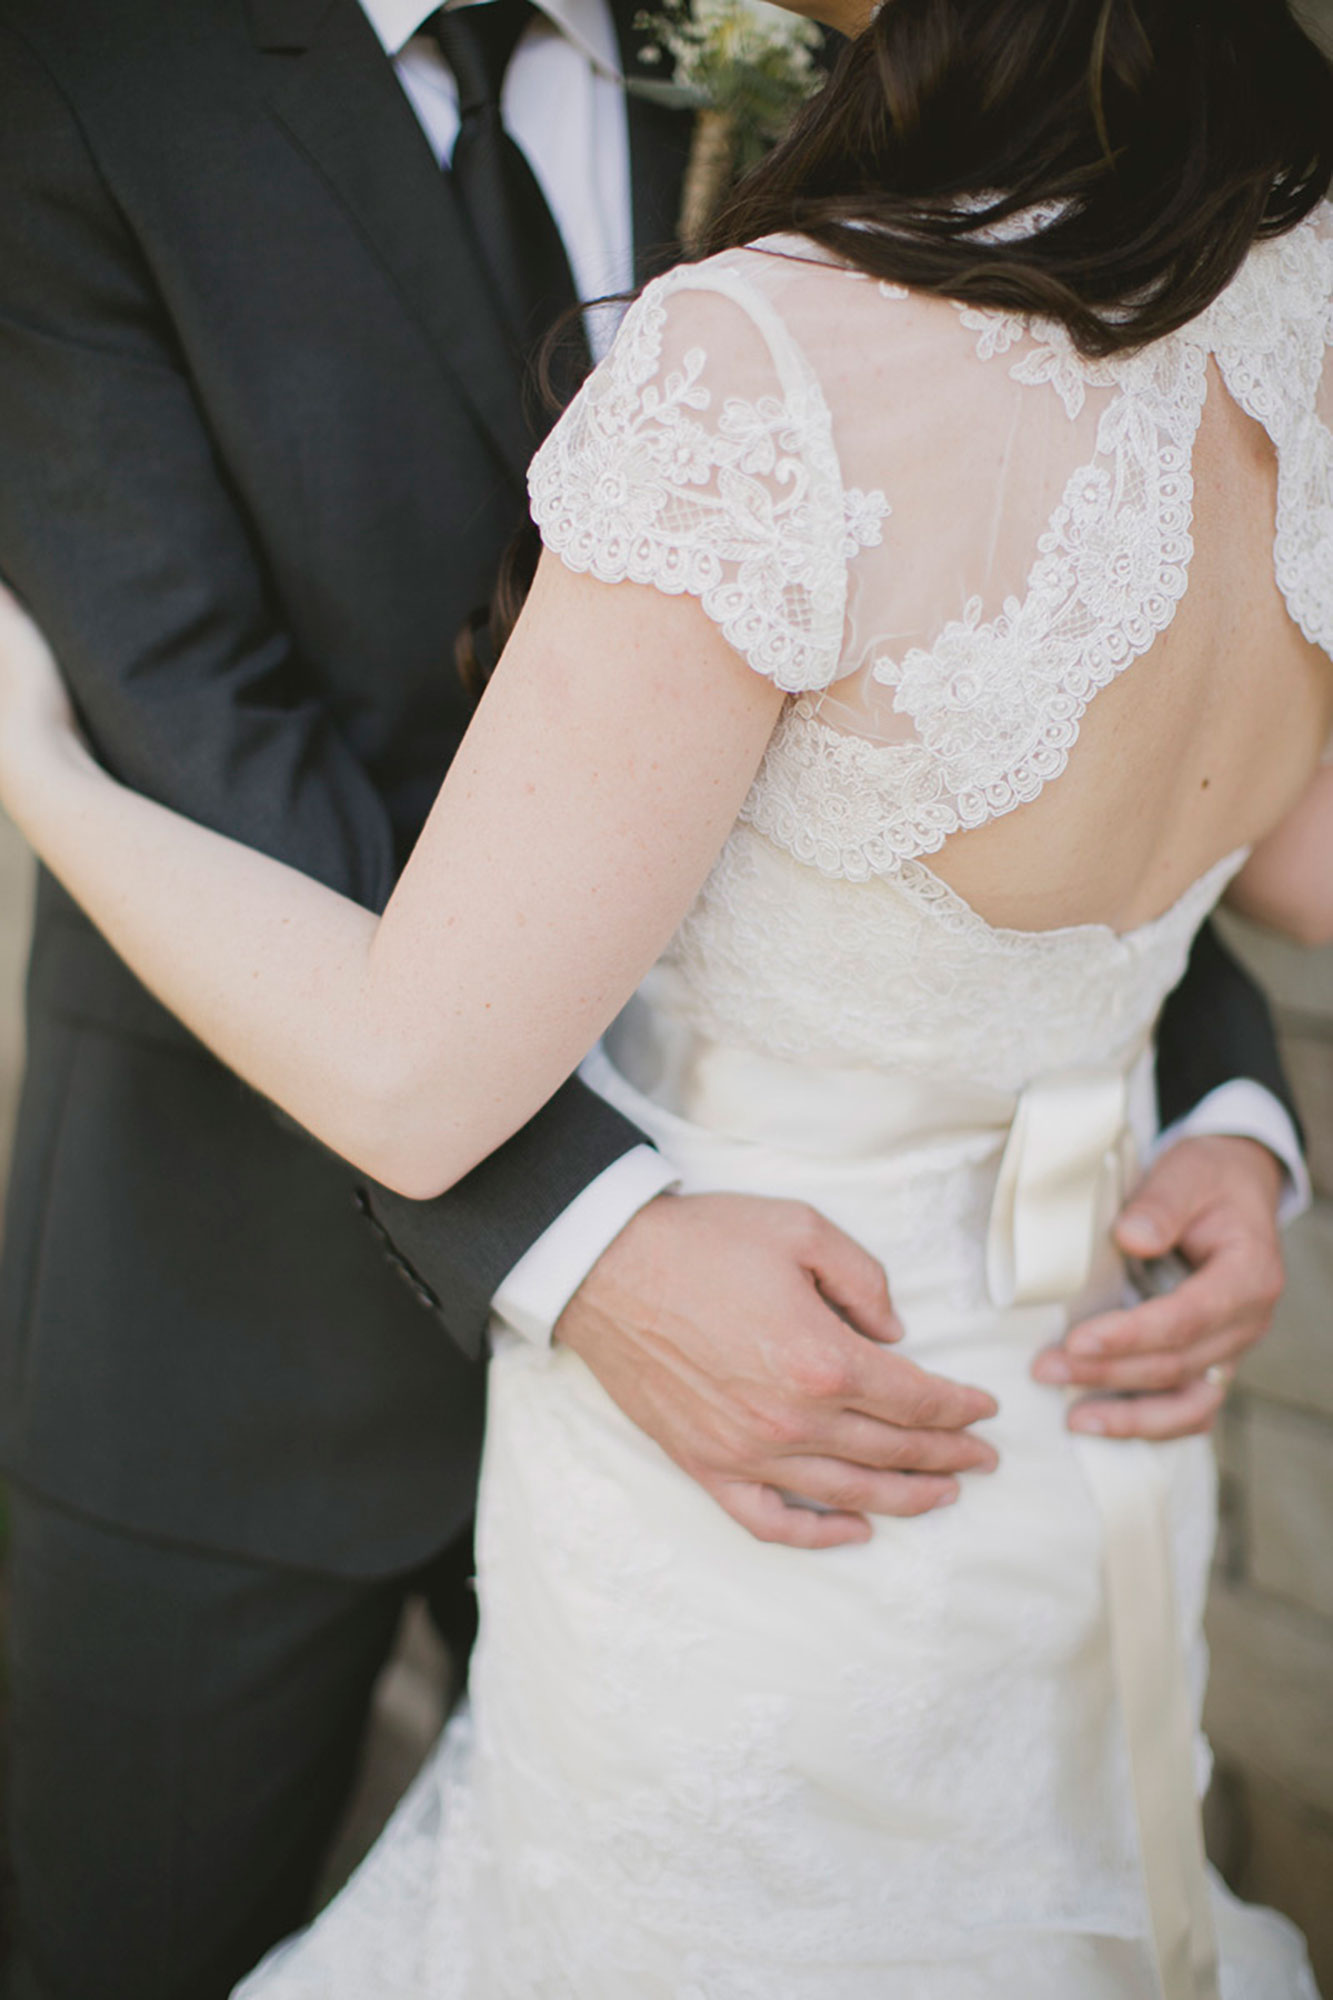 Balls-Falls-Vineyard-Bride-Photo-By-Elizabeth-in-Love-019.jpg